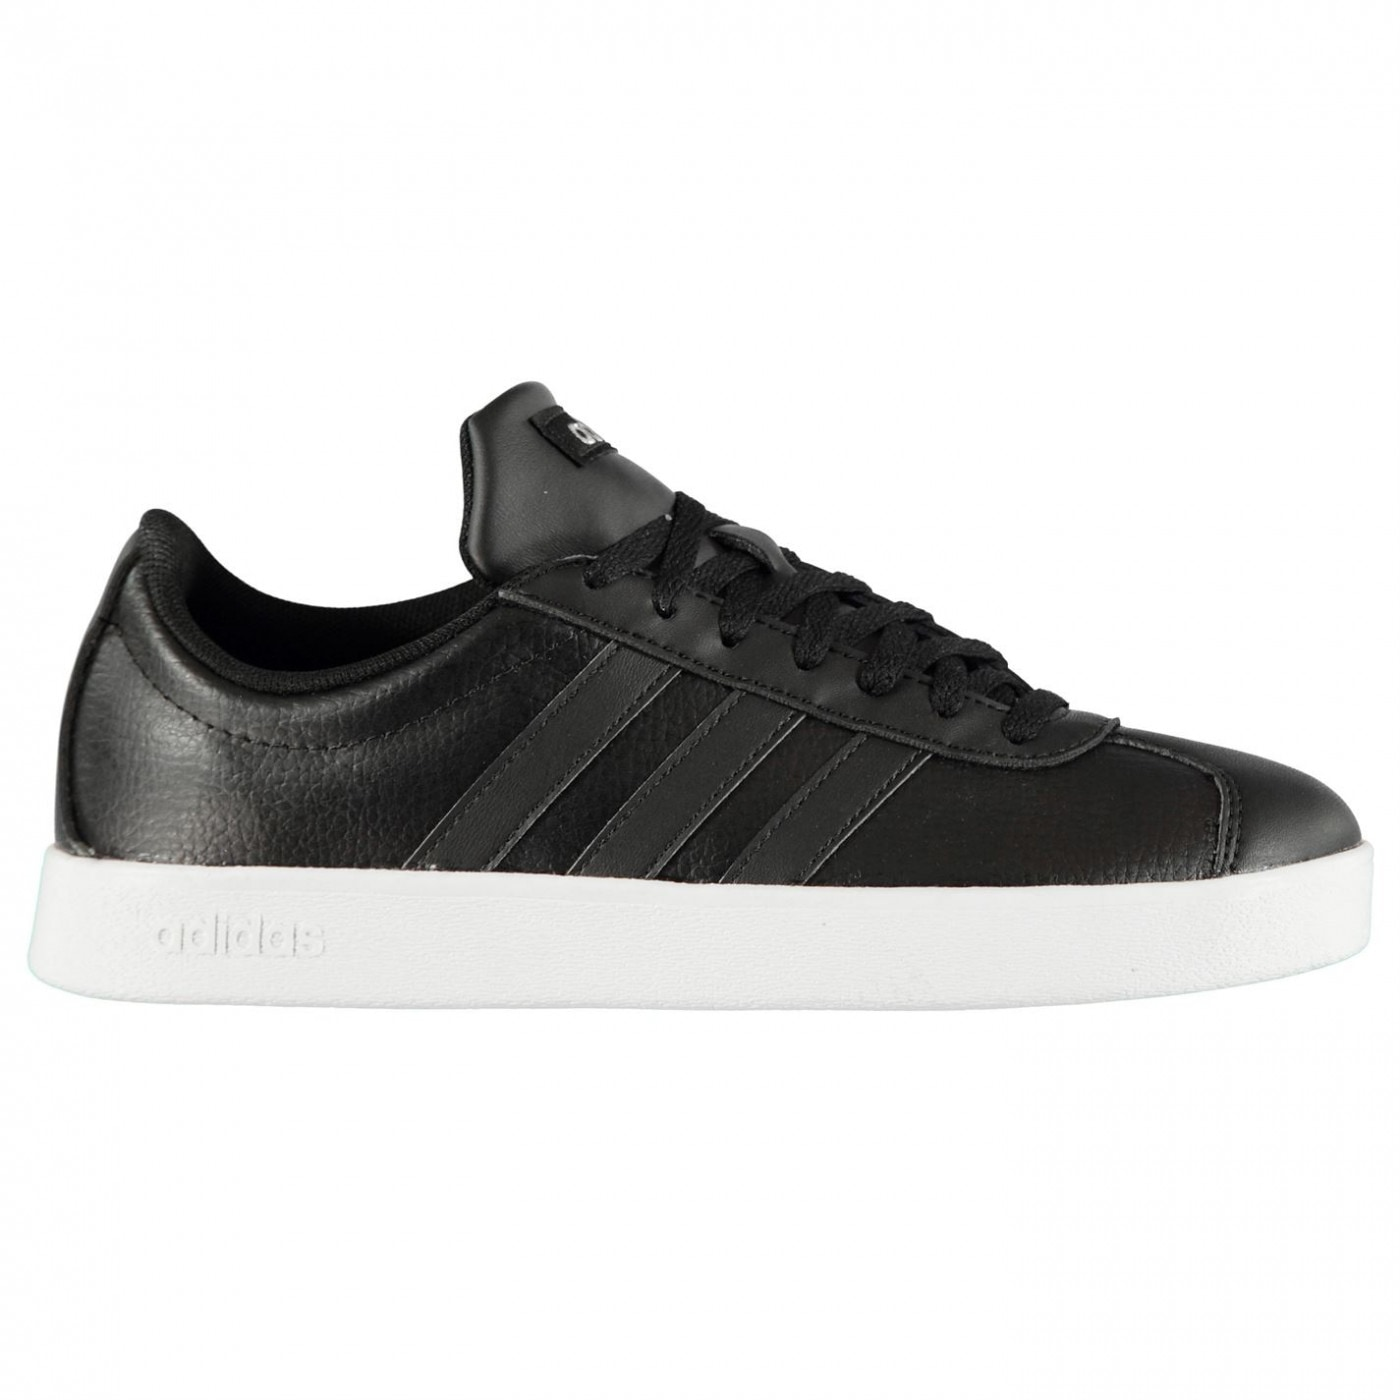 Adidas VL Court 2 Trainers Ladies